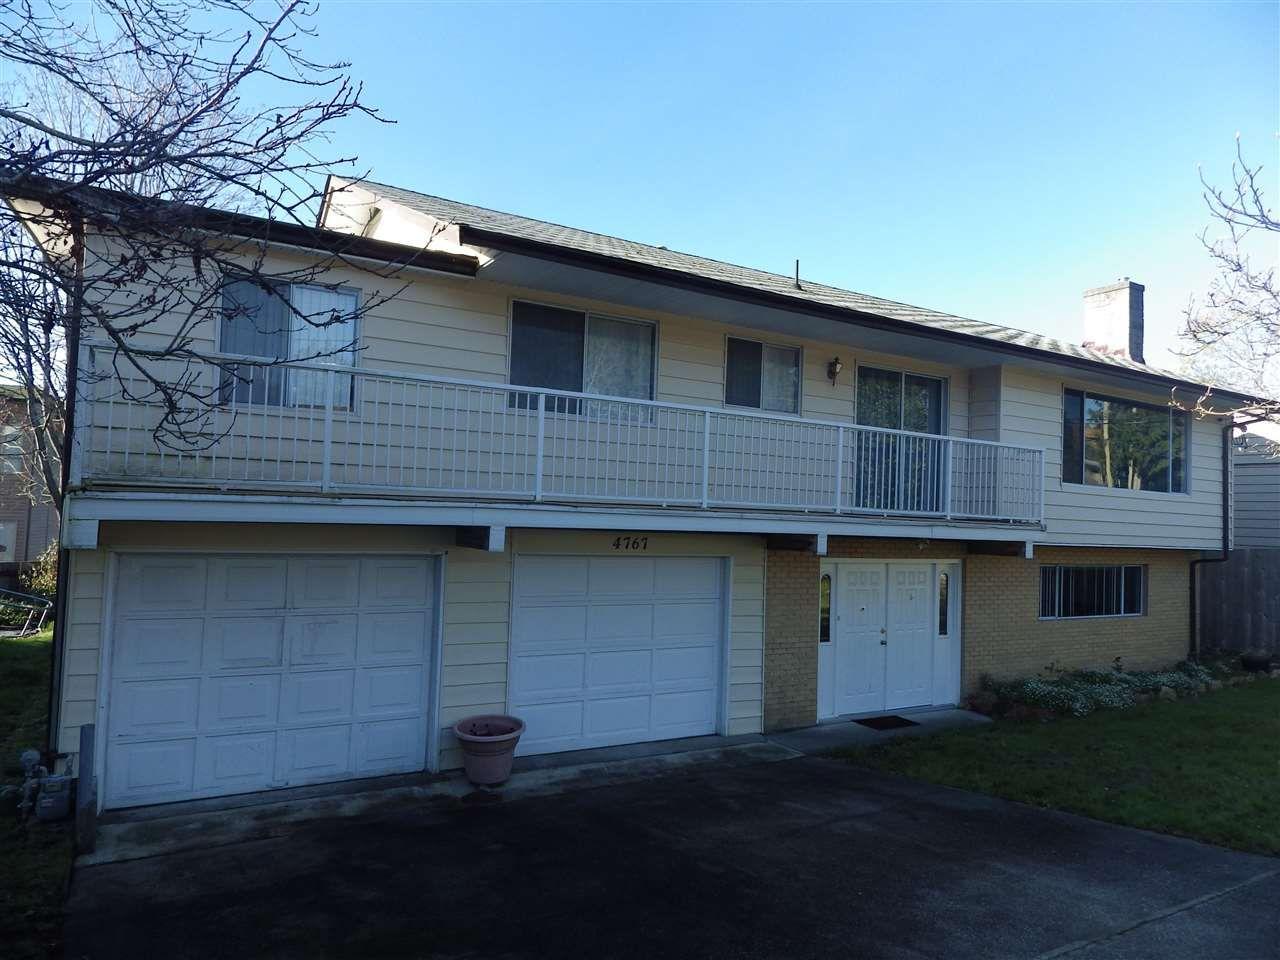 Main Photo: 4767 FIR Road in Sechelt: Sechelt District House for sale (Sunshine Coast)  : MLS®# R2342148